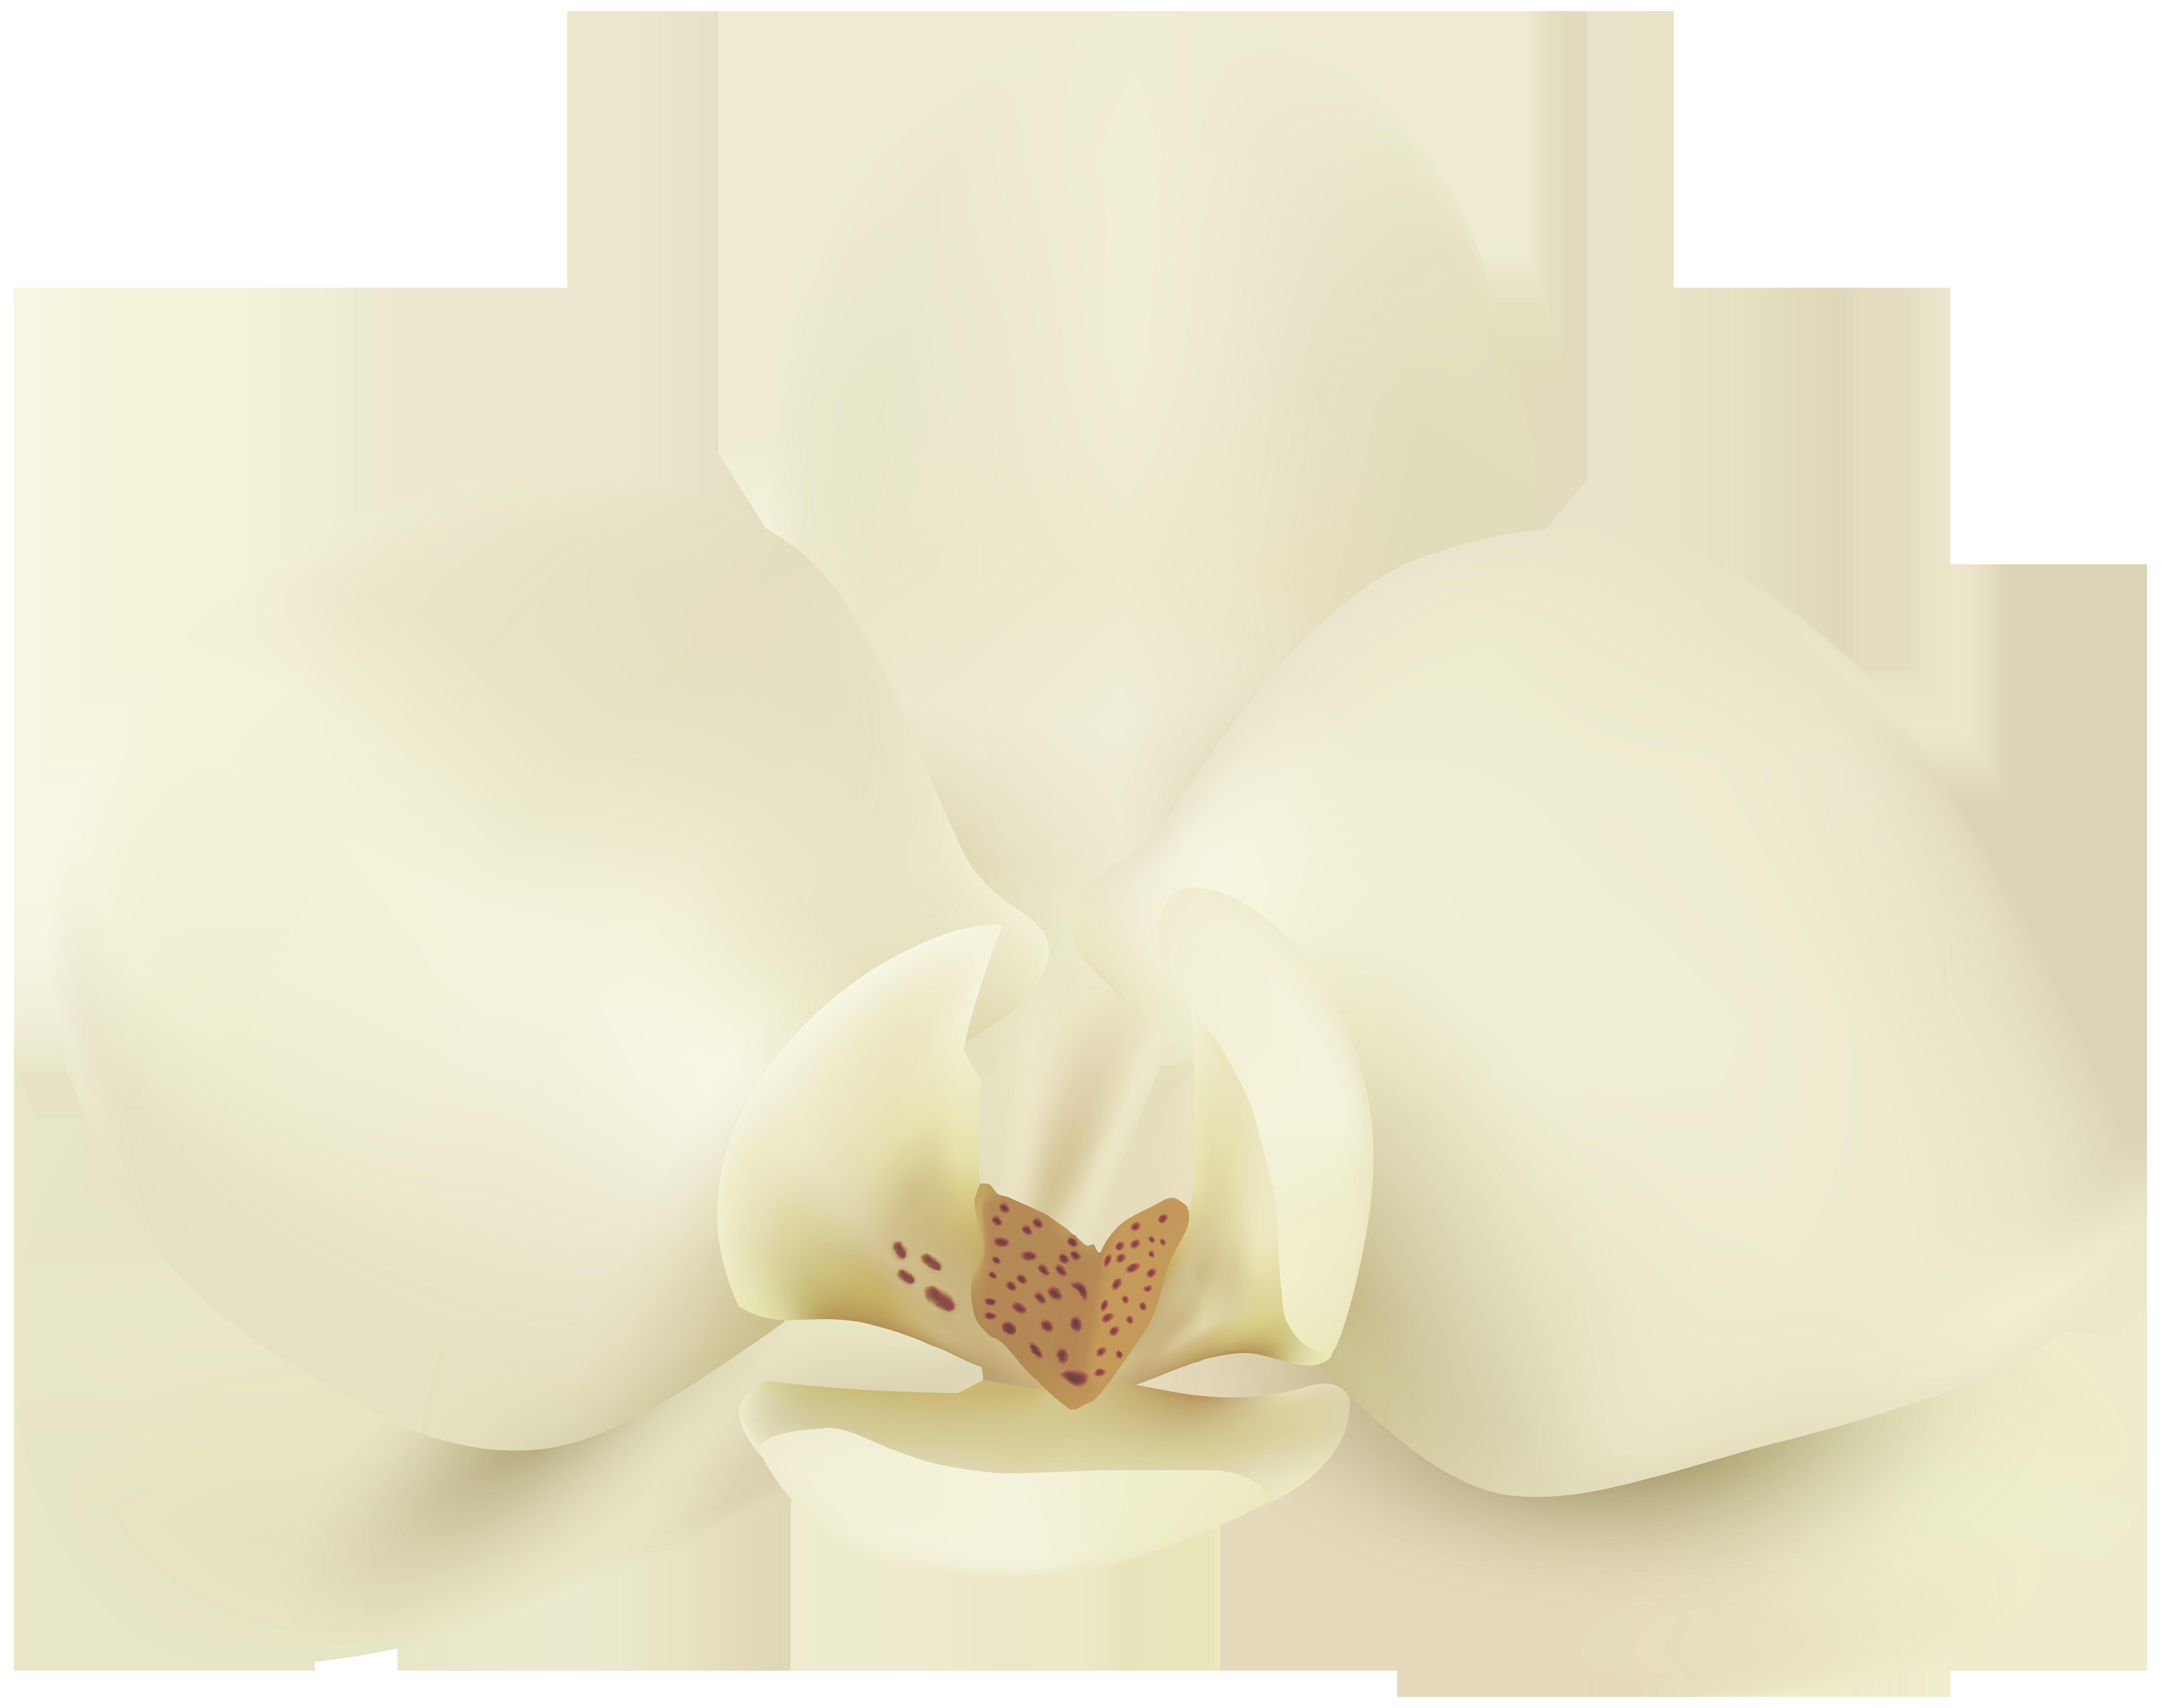 Clip art image gallery. Vanilla flower png